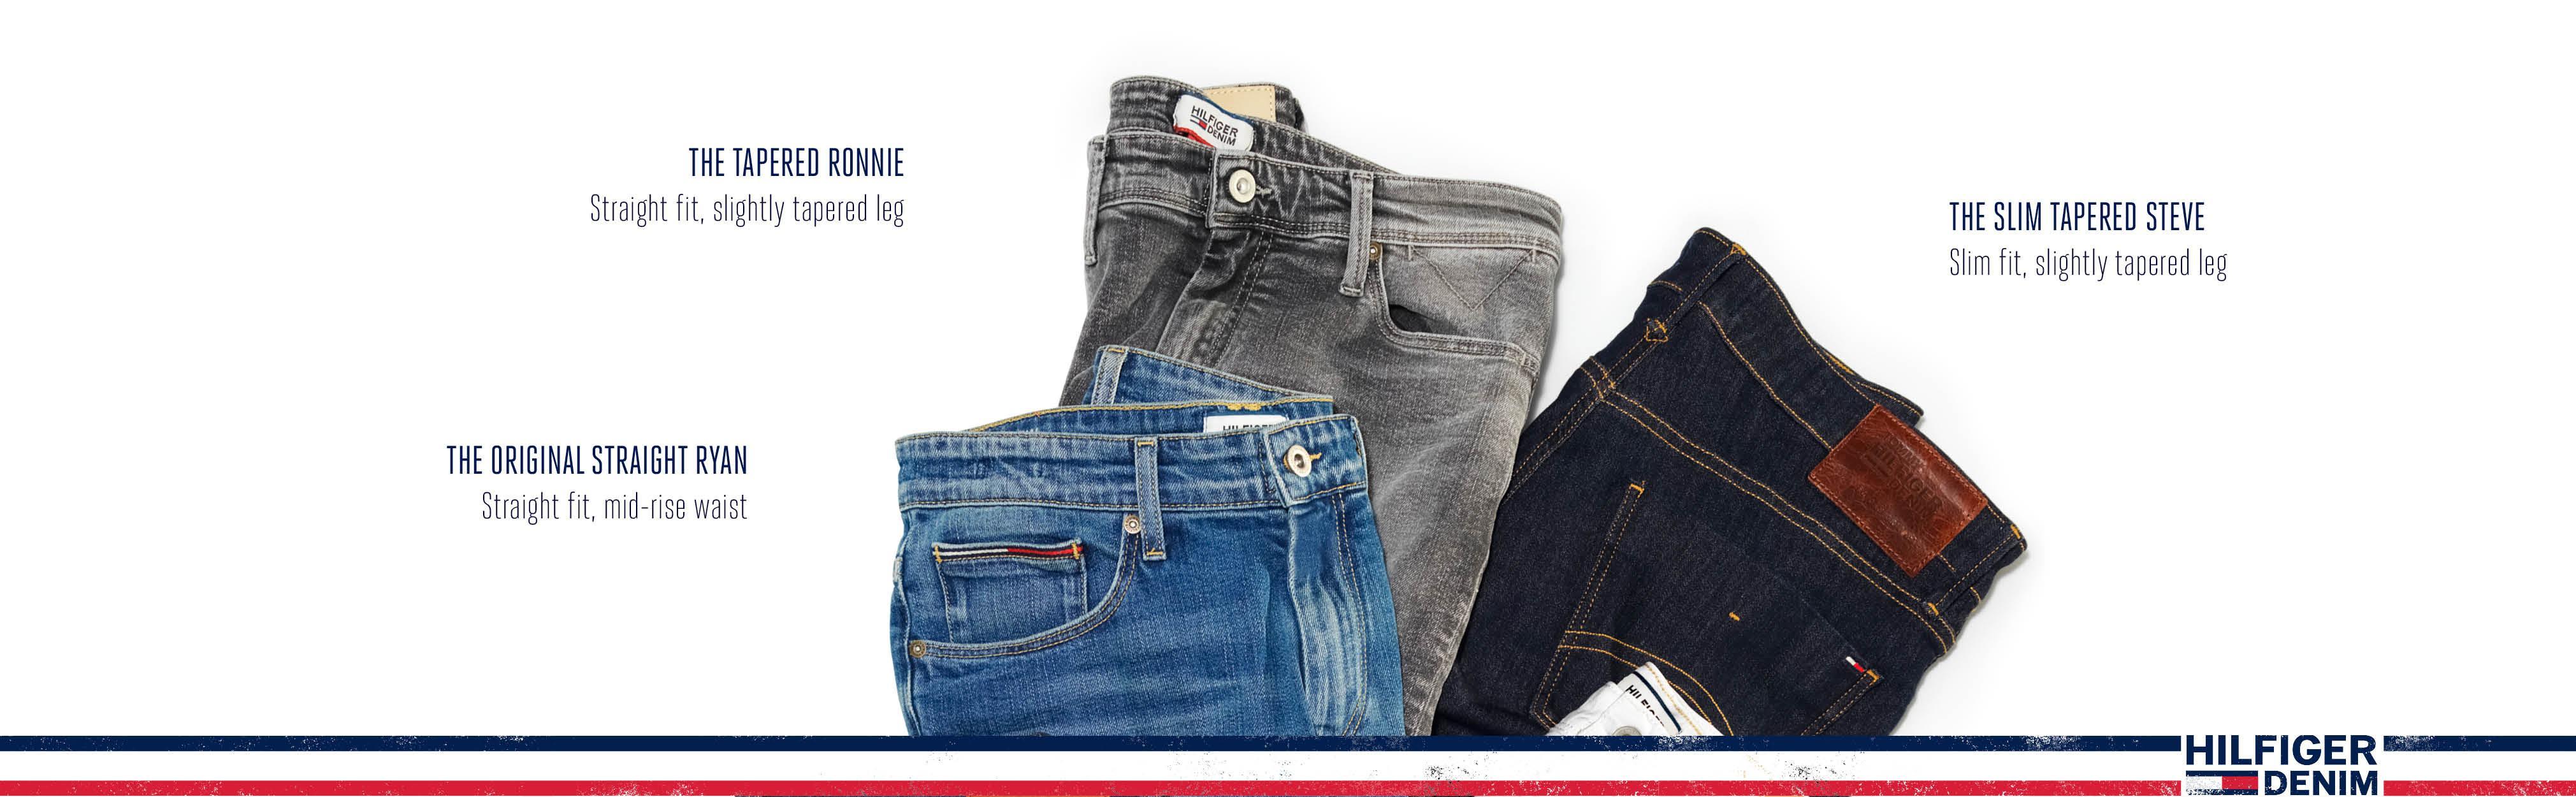 f660b54e134fed tommy hilfiger denim, tommy hilfiger men, tommy hilfiger jeans, tommy jeans,  mens